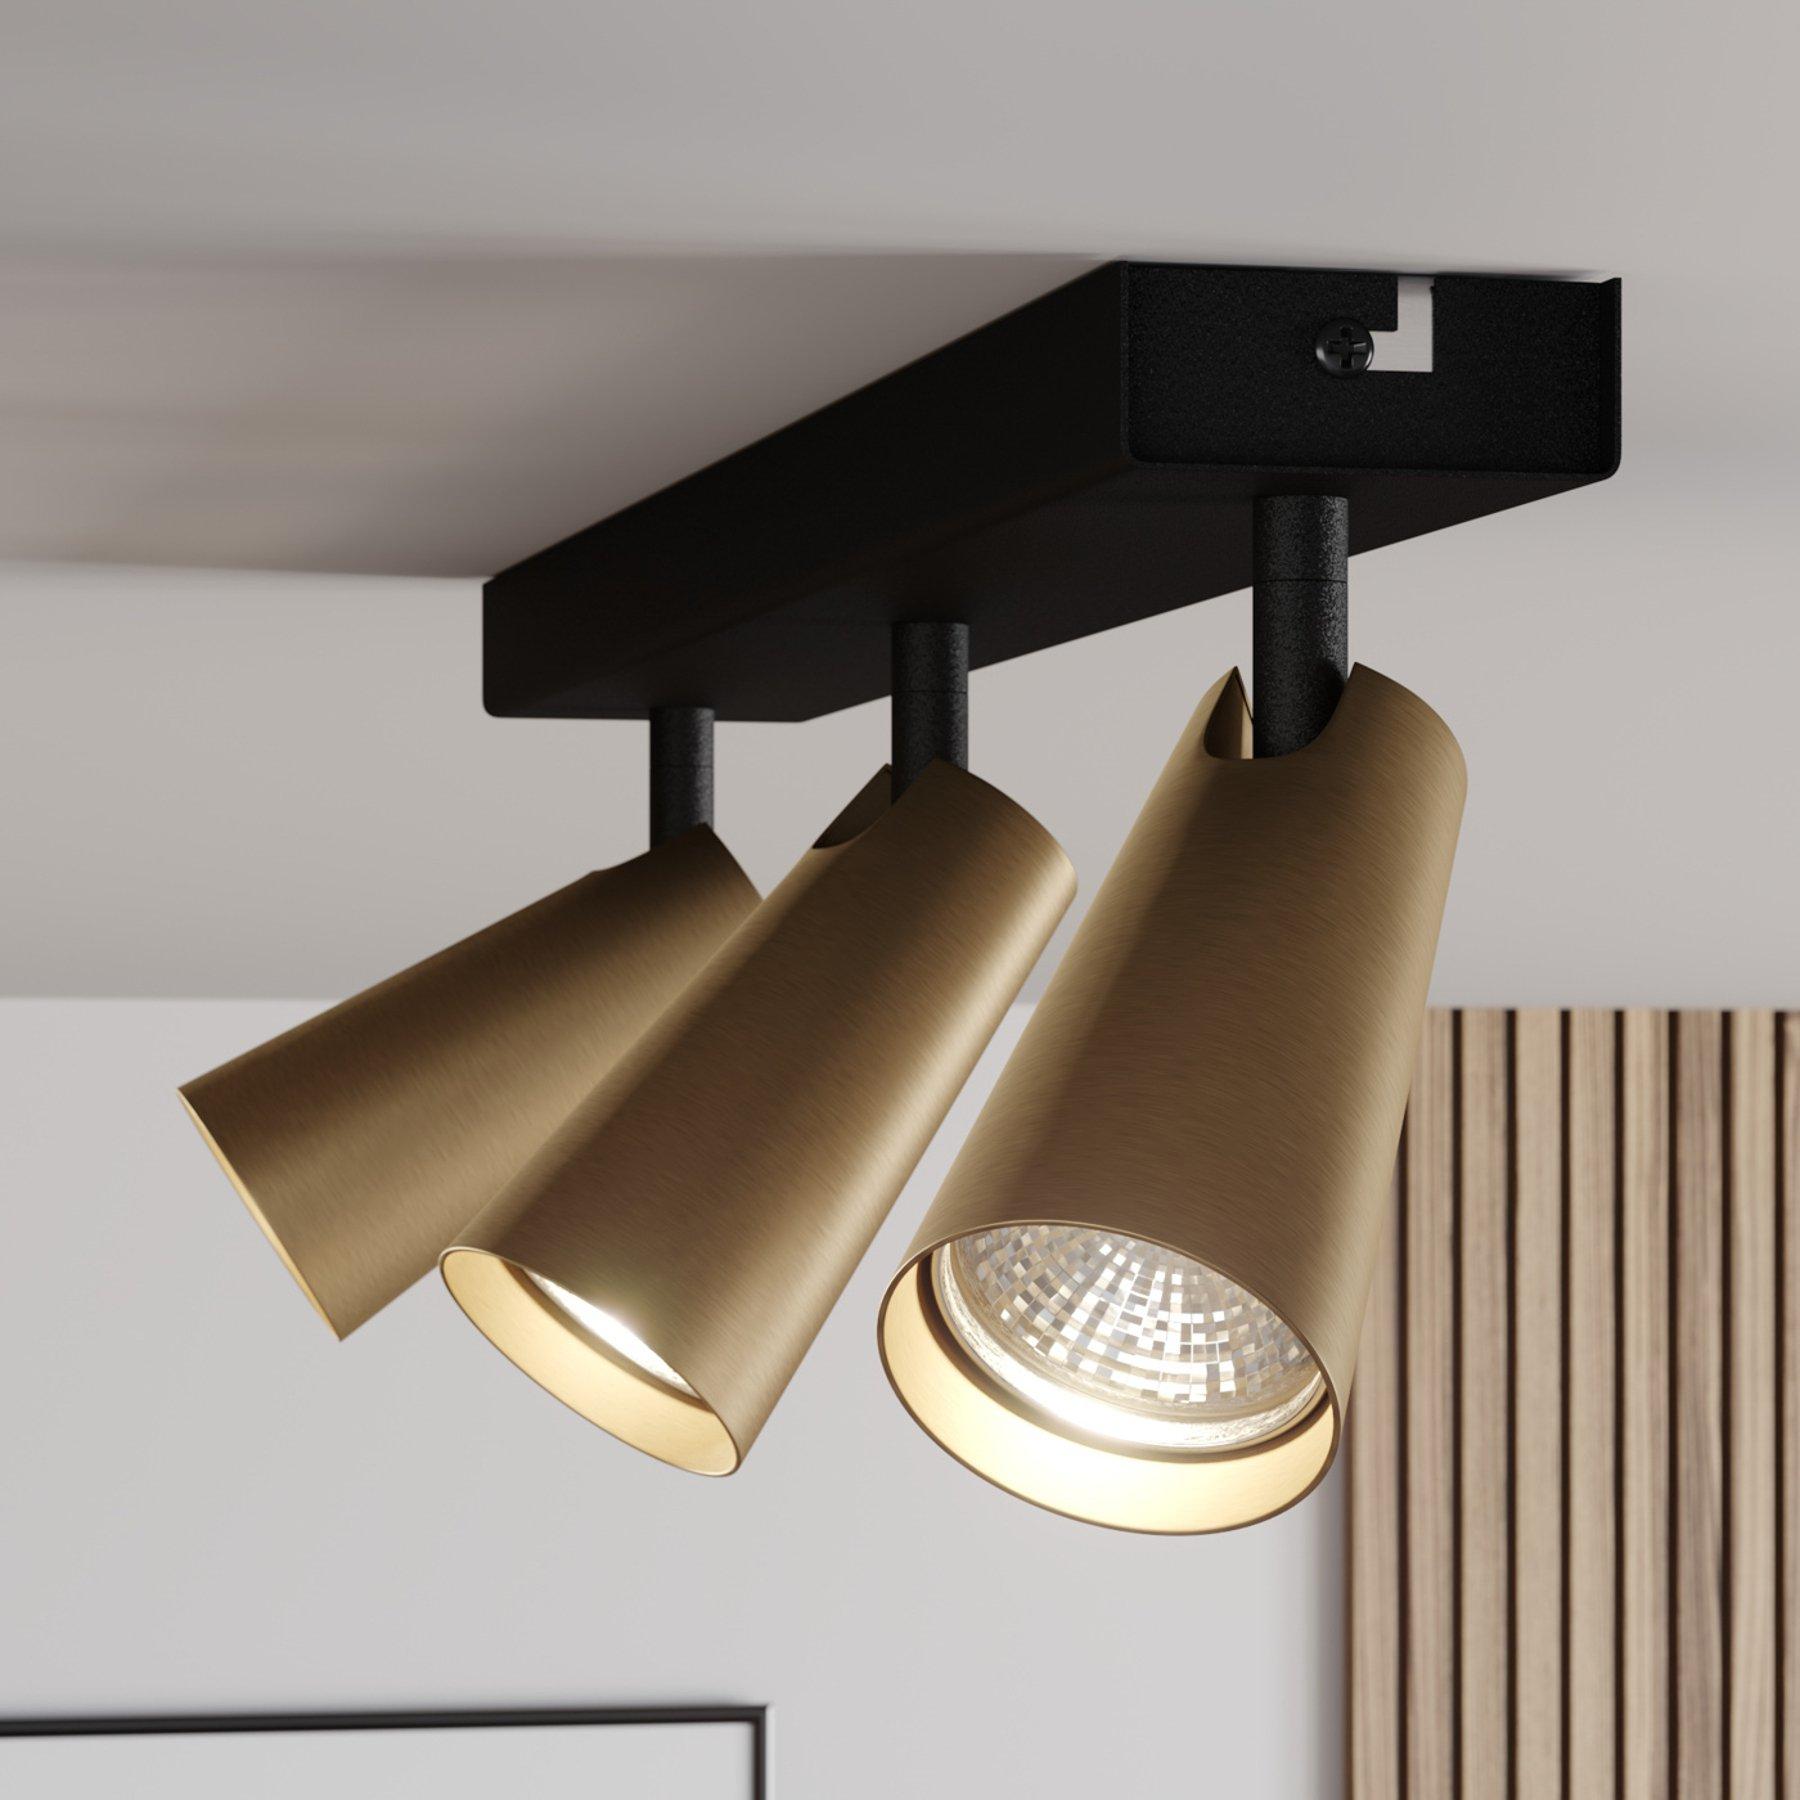 Lucande Angelina taklampe, messing-gull, 3 lysk.